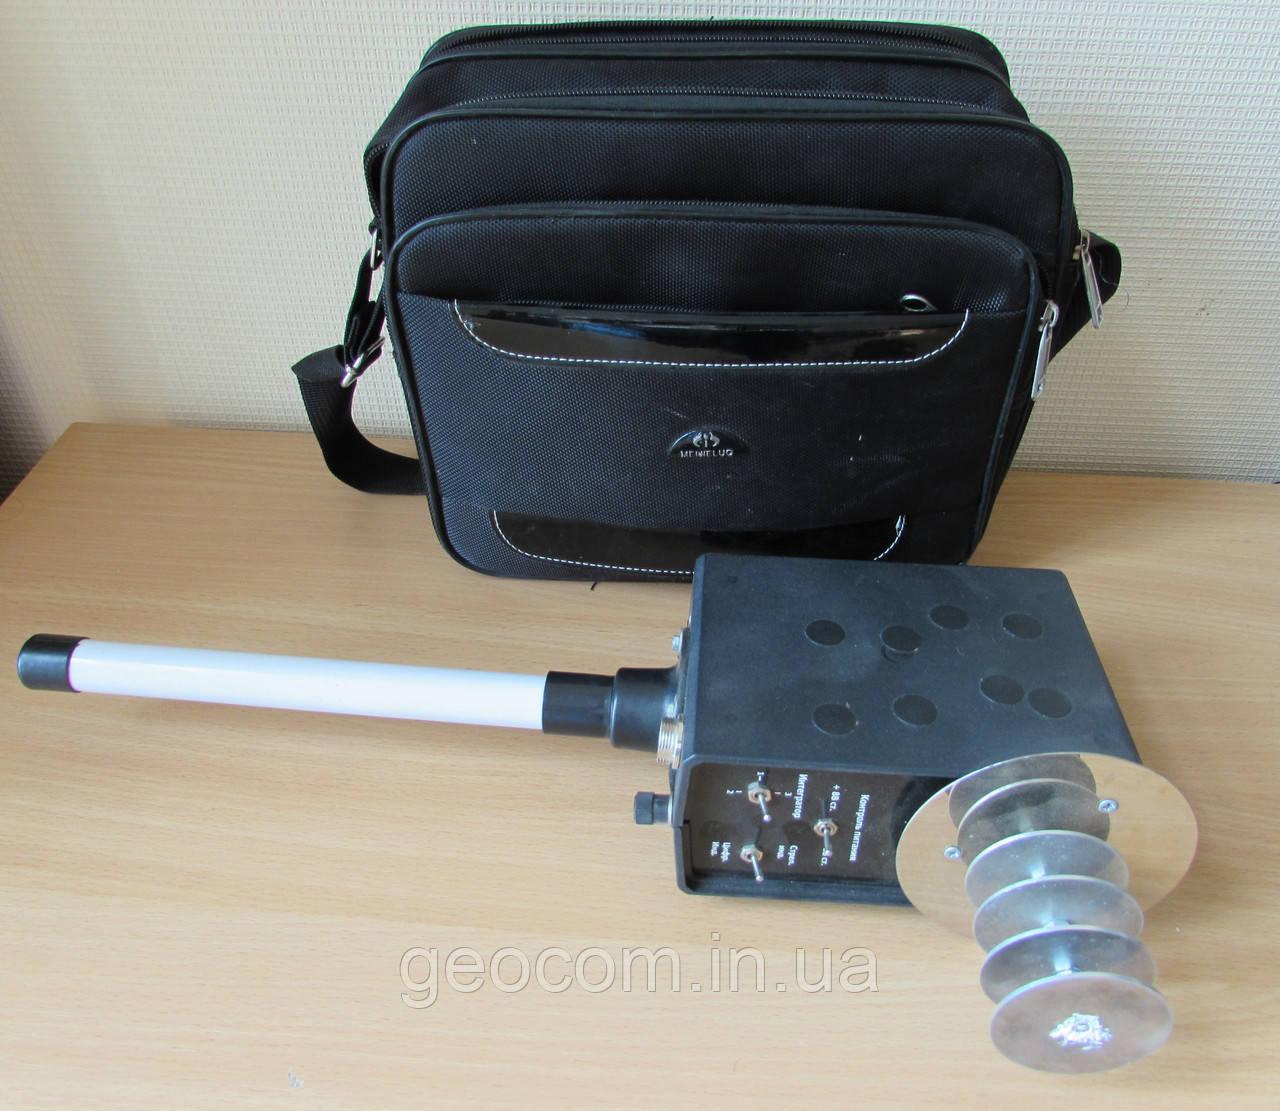 ВЕГА-10 для пошуку підземних порожнин